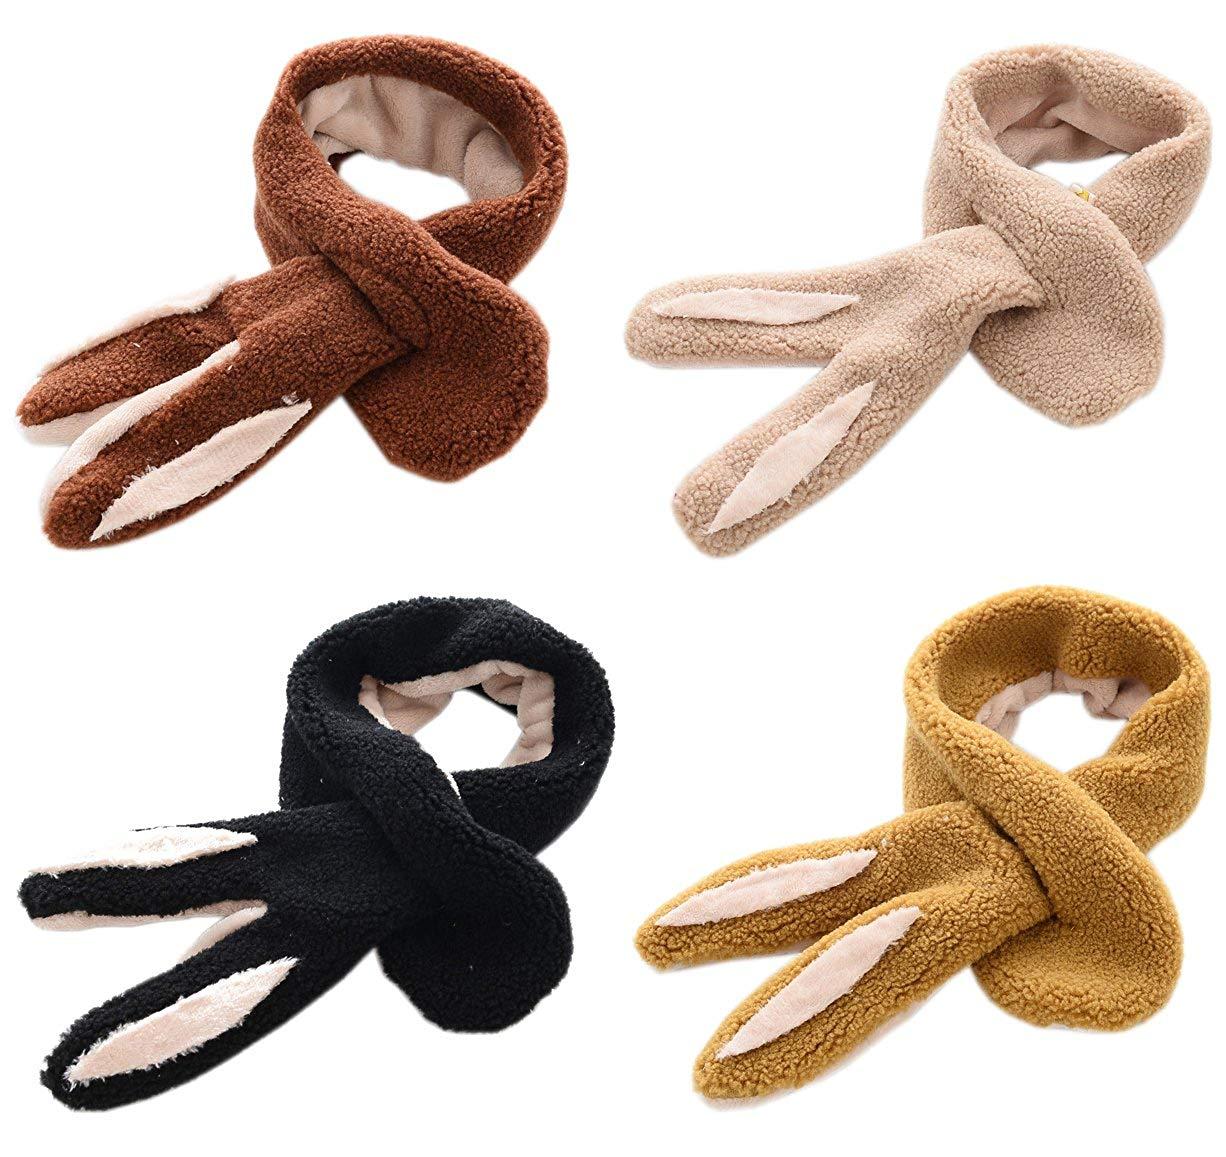 AnVei-Nao Girls Boys Winter Warmer Child Kids Thick Rabbit Ear Furry Plush Scarf